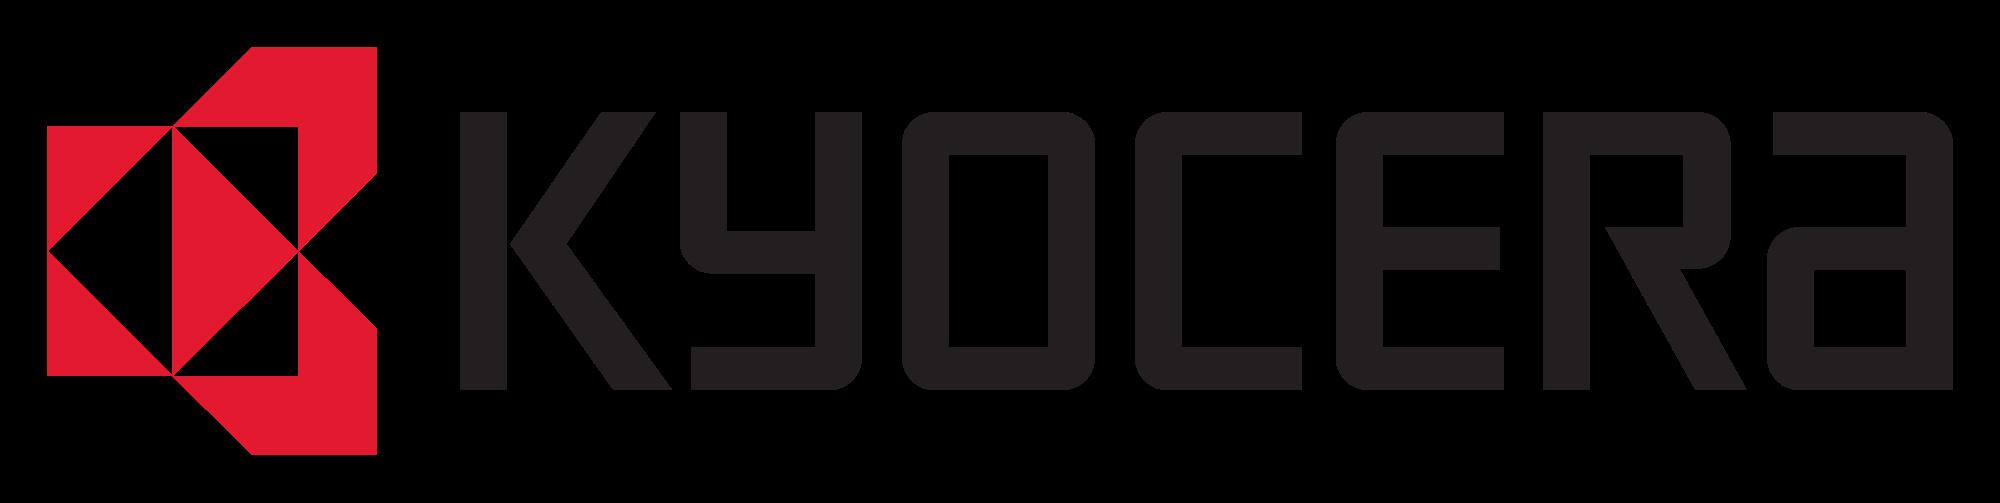 Kyocera_logo